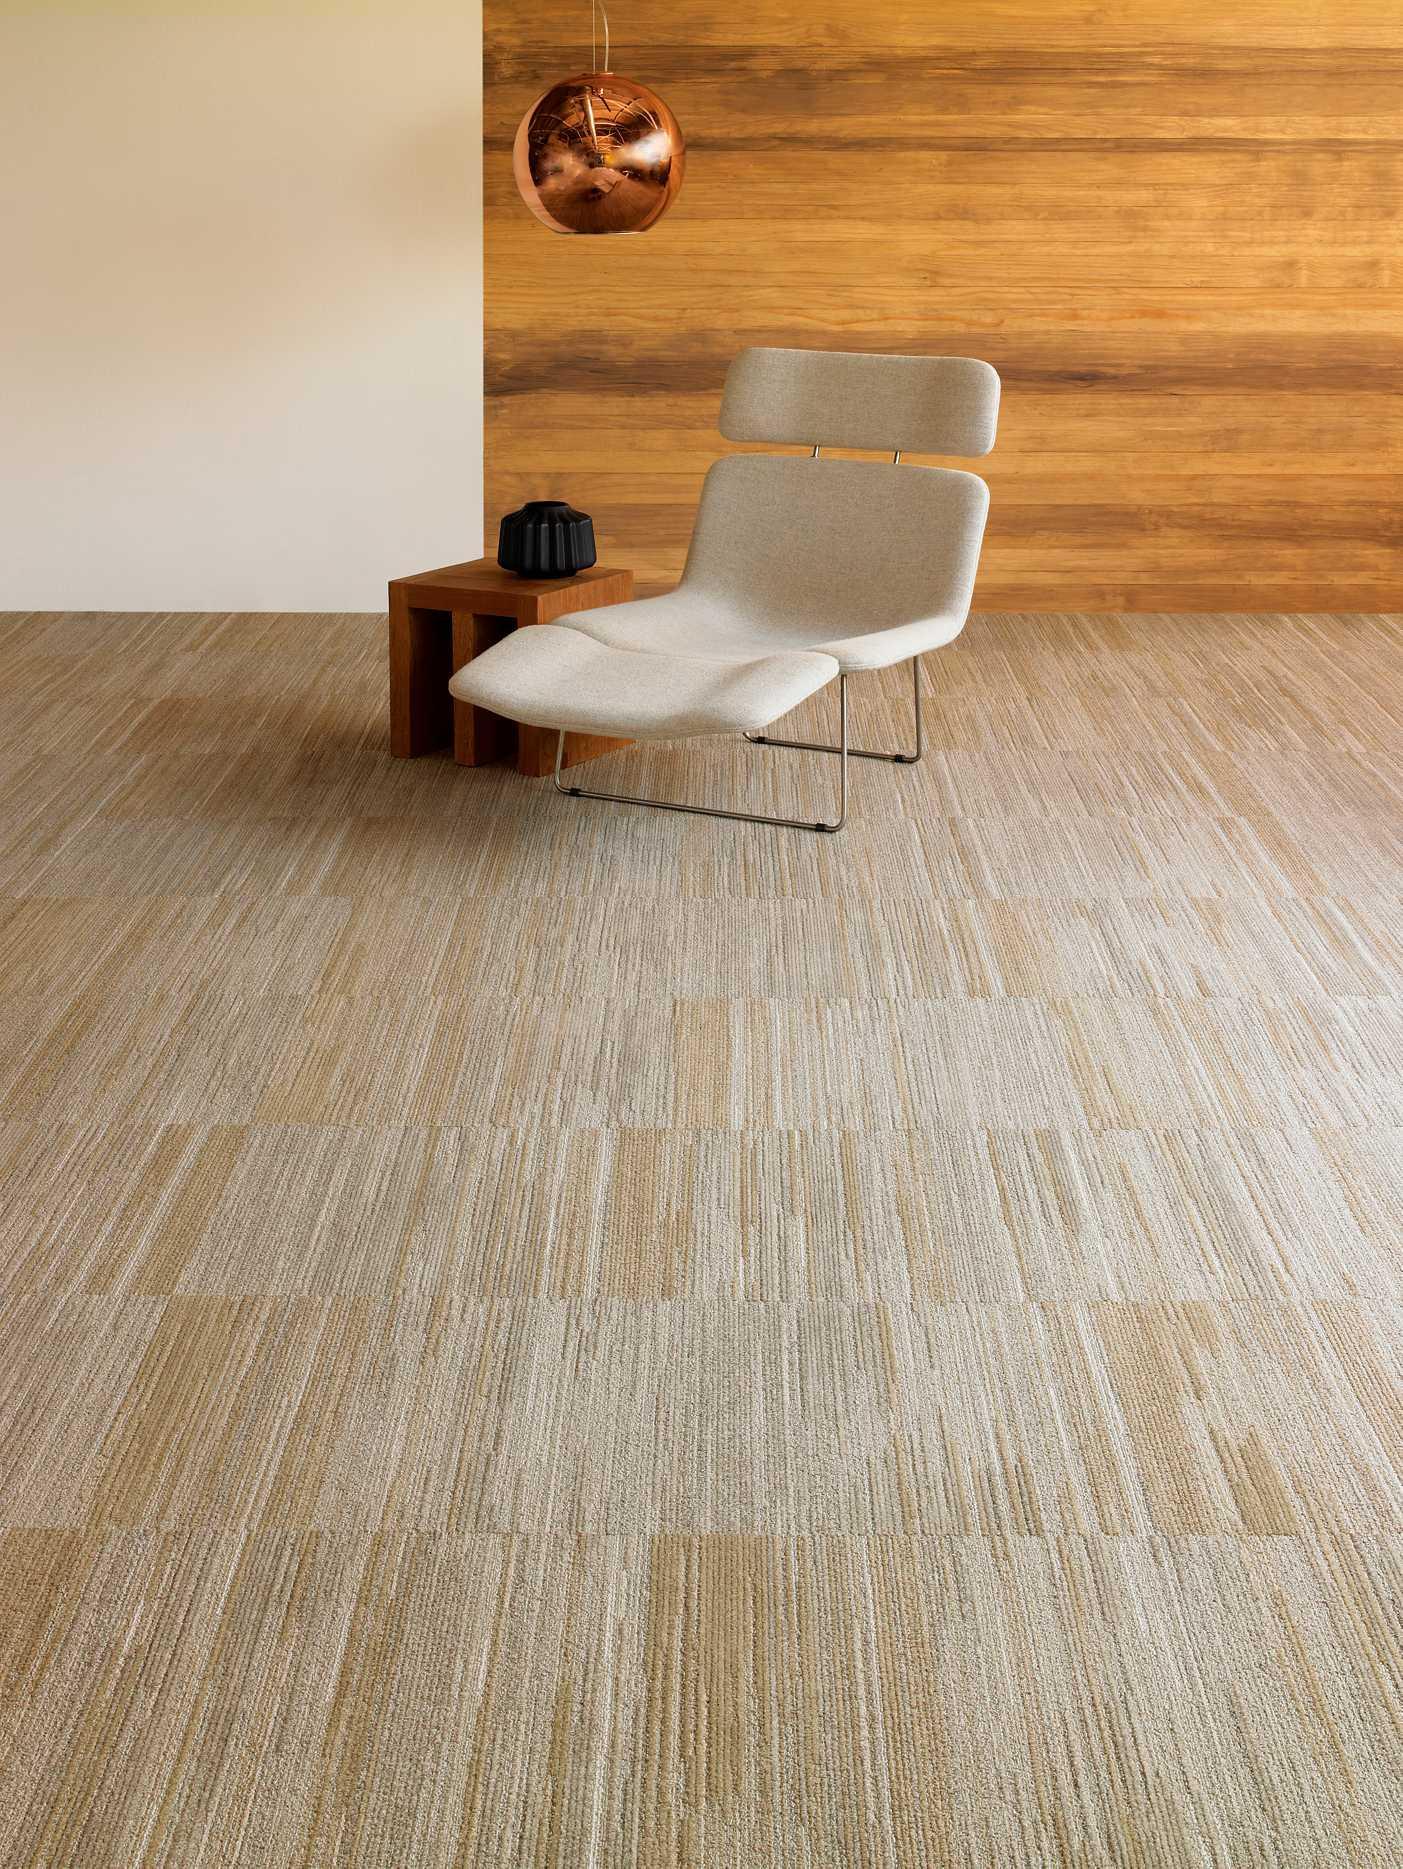 model hardwood flooring canada of ingrain tile 59339 shaw contract shaw hospitality in 59339